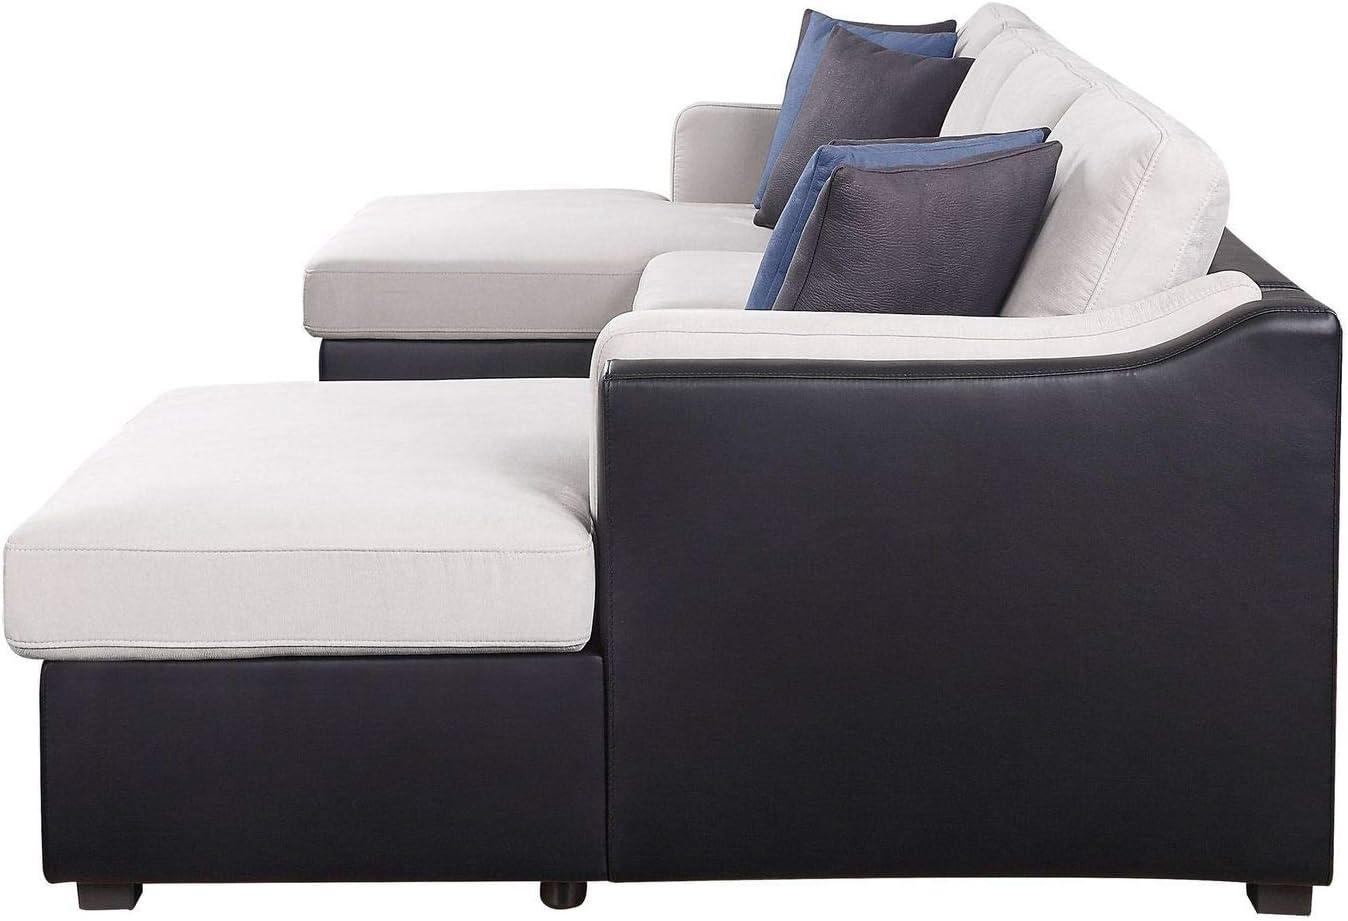 Pumpumly Merill Sectional Sofa w Ranking TOP15 P Black Fabric overseas Beige Sleeper